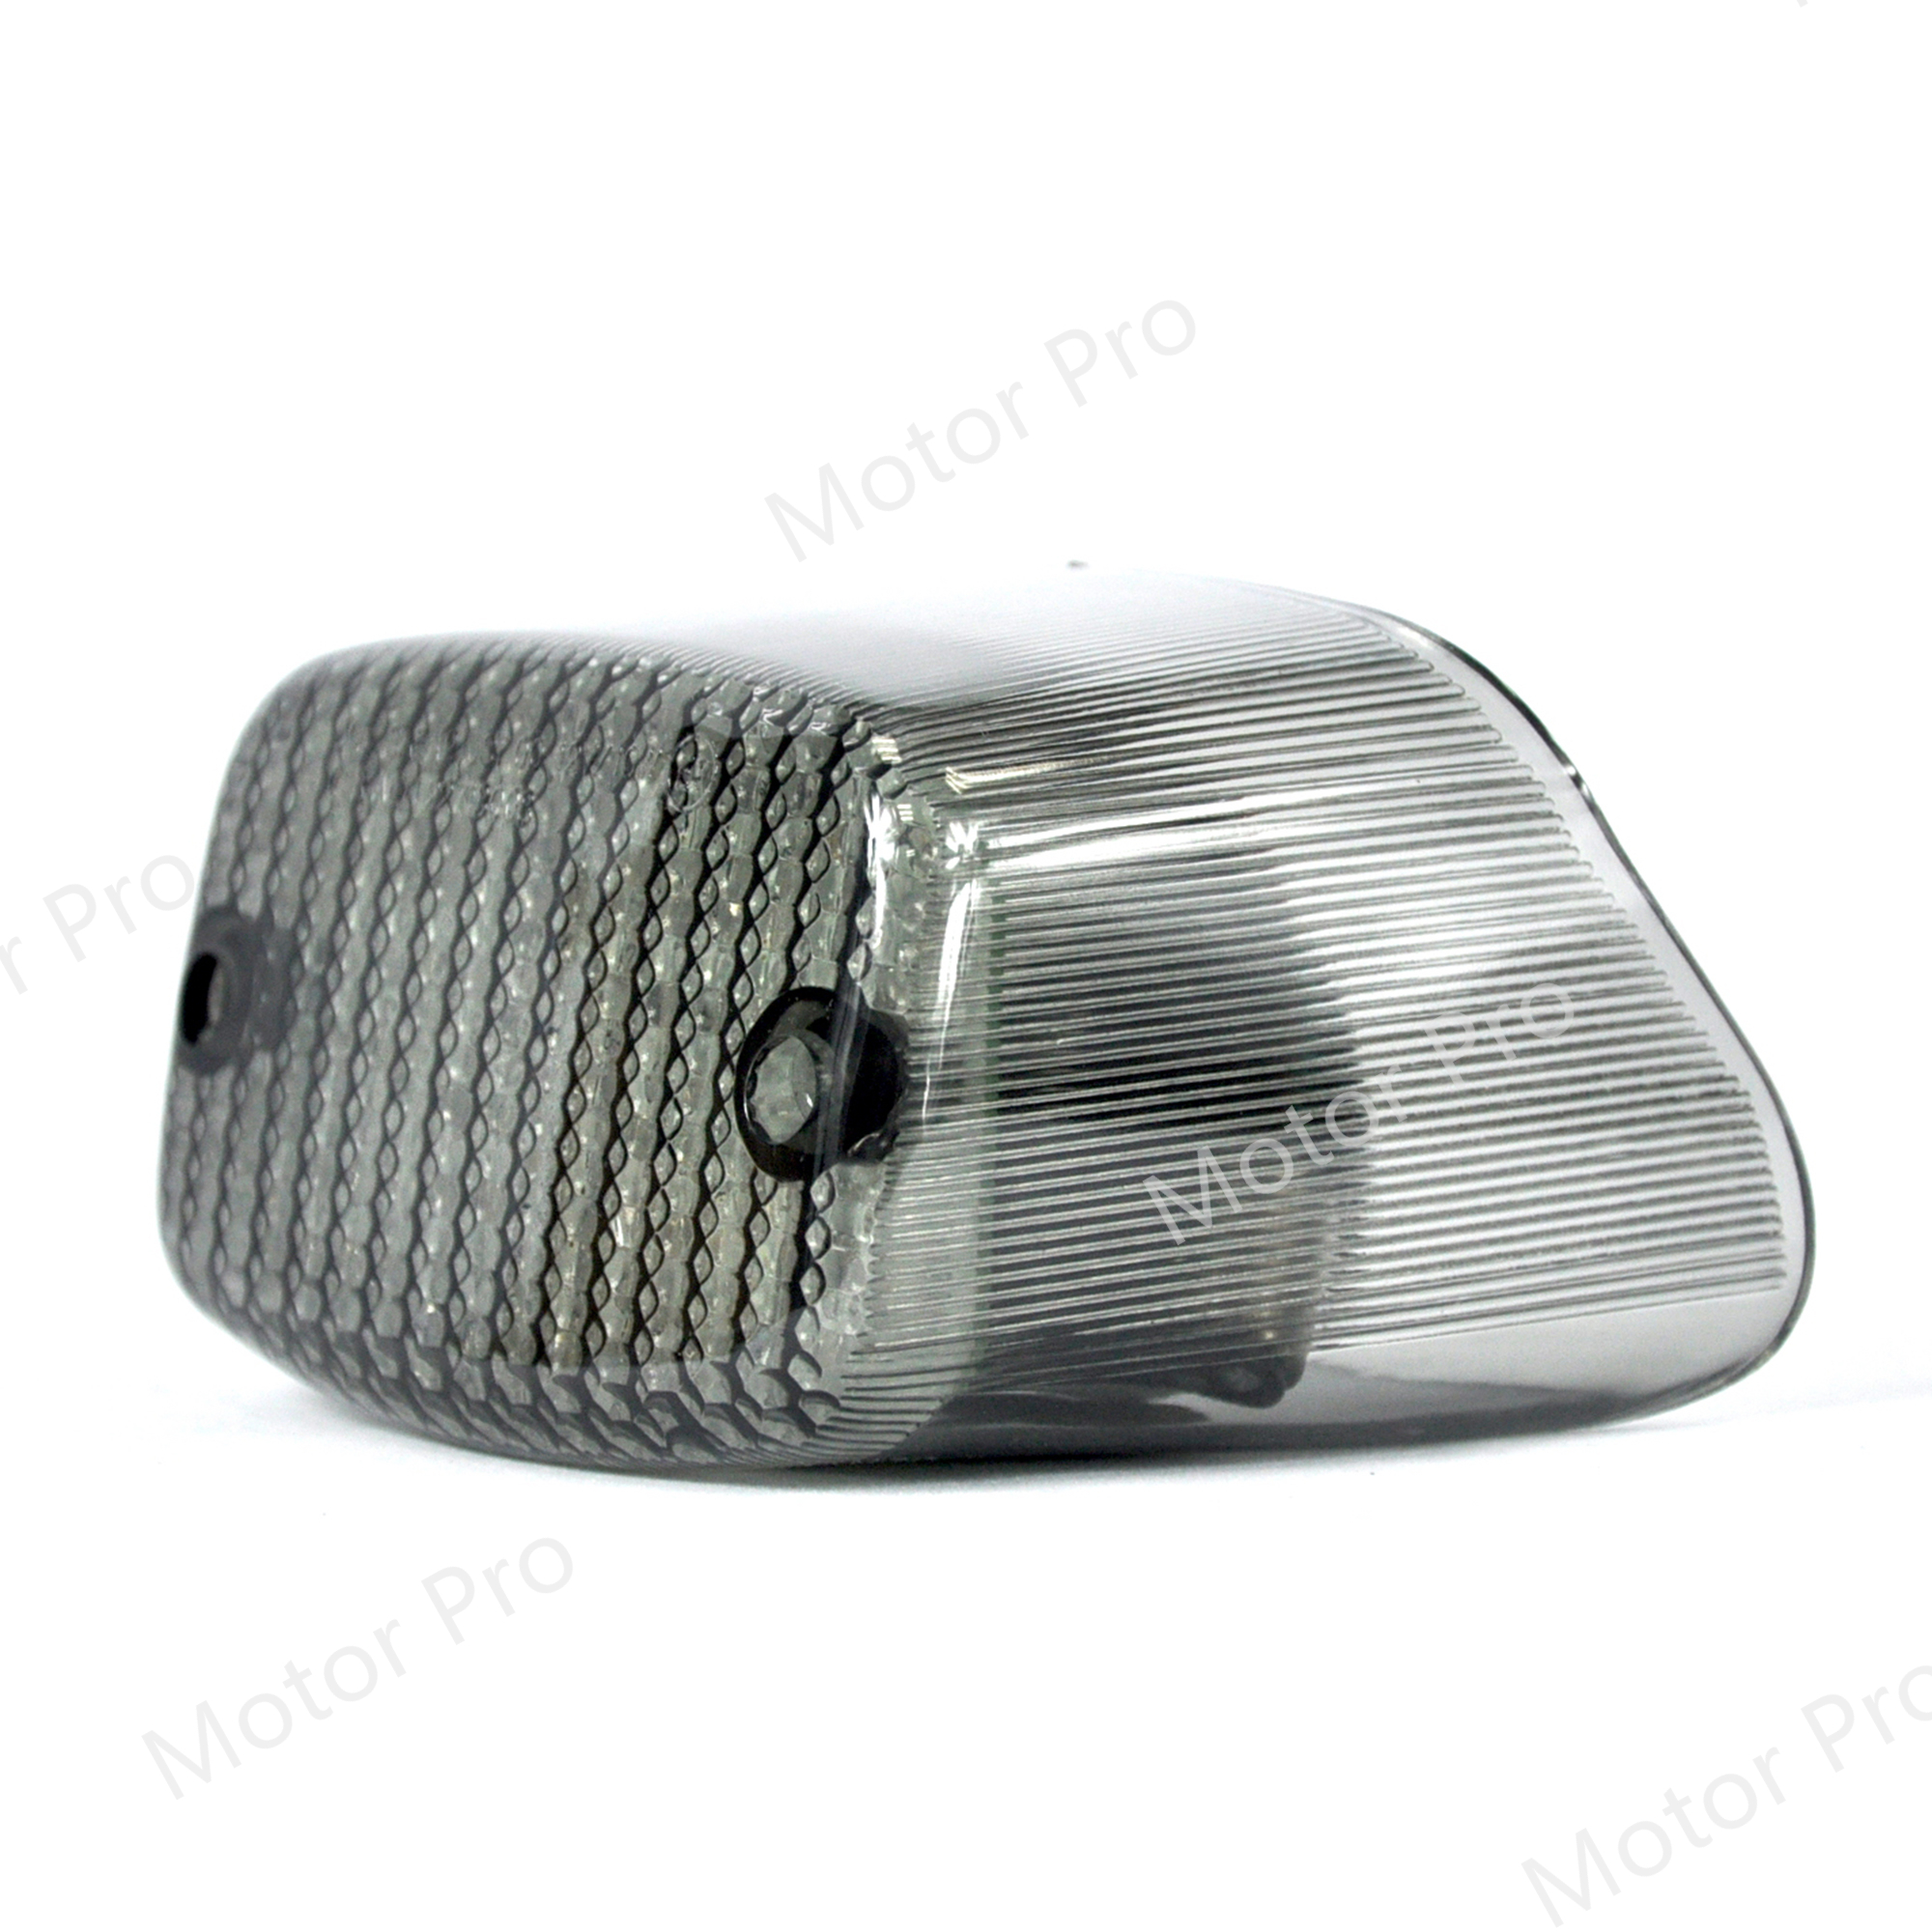 Brake Tail Light LED Smoke with Integrated Turn Signal for Yamaha 1985-2007 Vmax